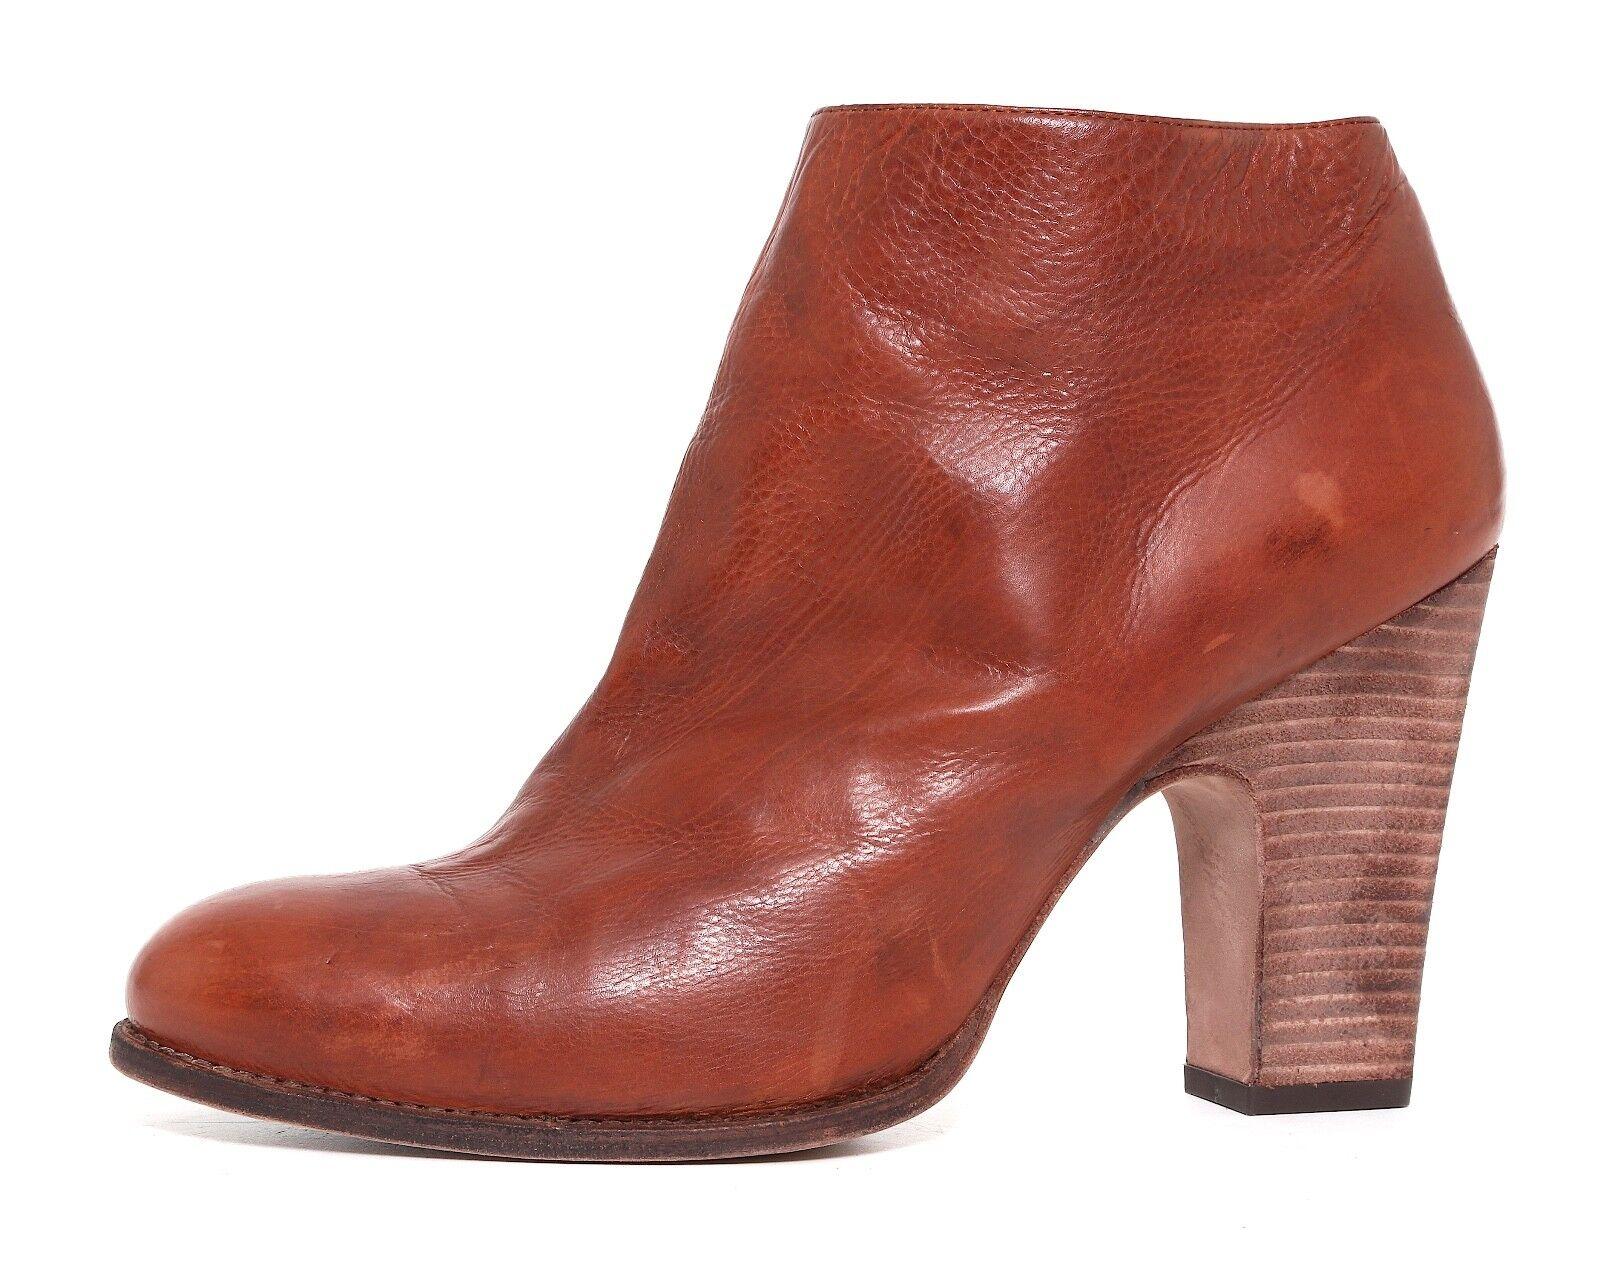 Stuart Weitzman Demigran Leather Ankle Boots Brown Women Sz 10 M 6570